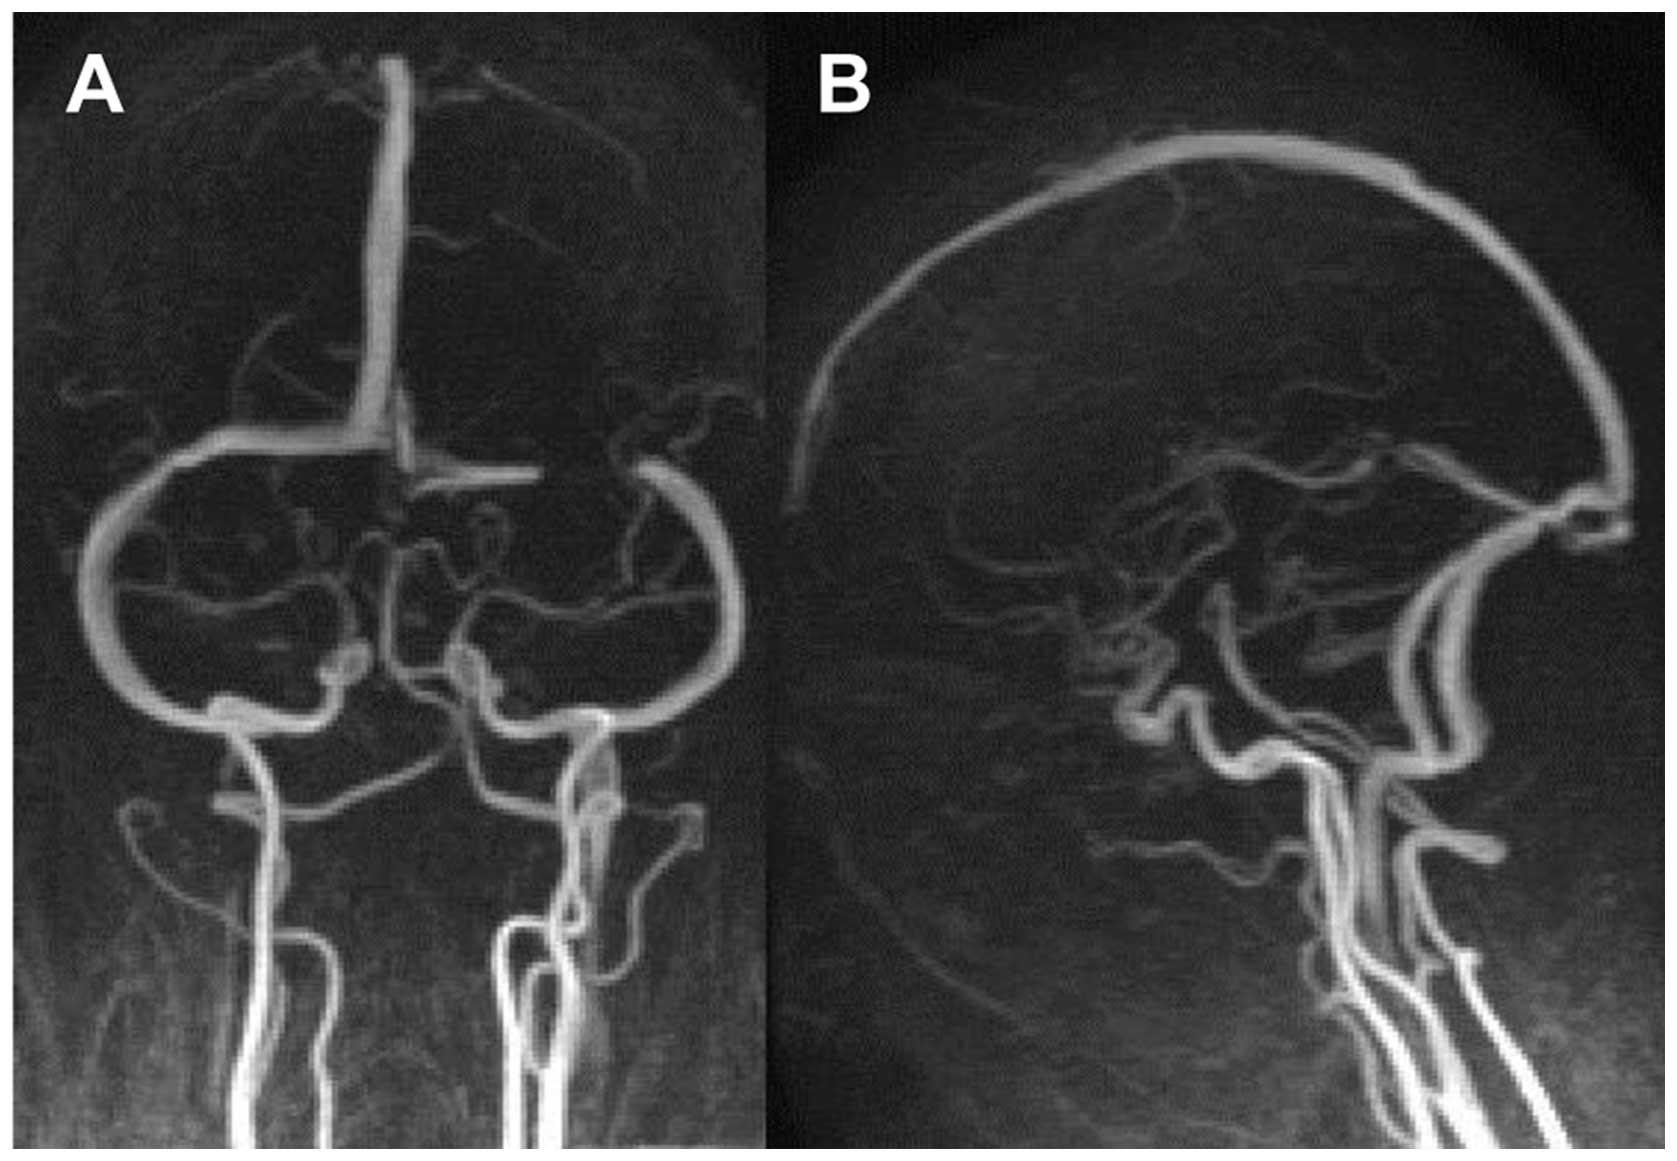 Cerebral Venous Sinus Thrombosis Concomitant With Leptomeningeal